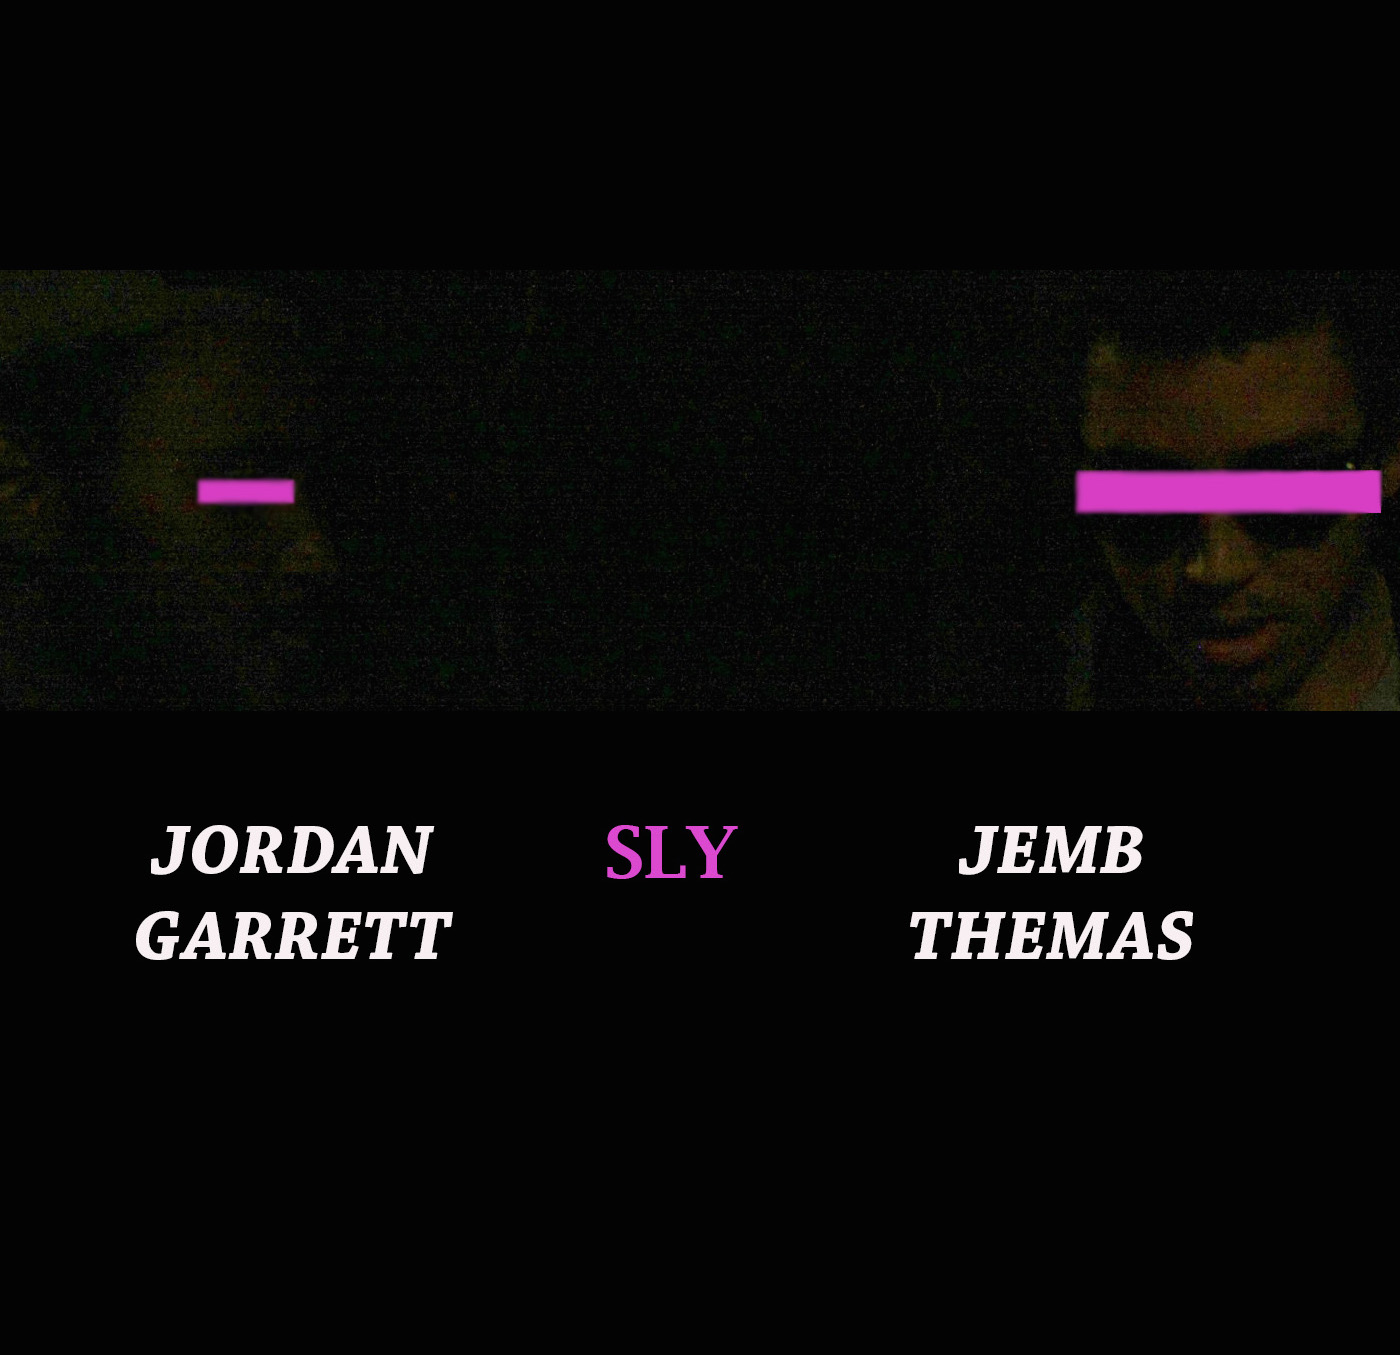 Sly by Dillon Daniel & Jordan Garrett ( produced by Jemb Themas)